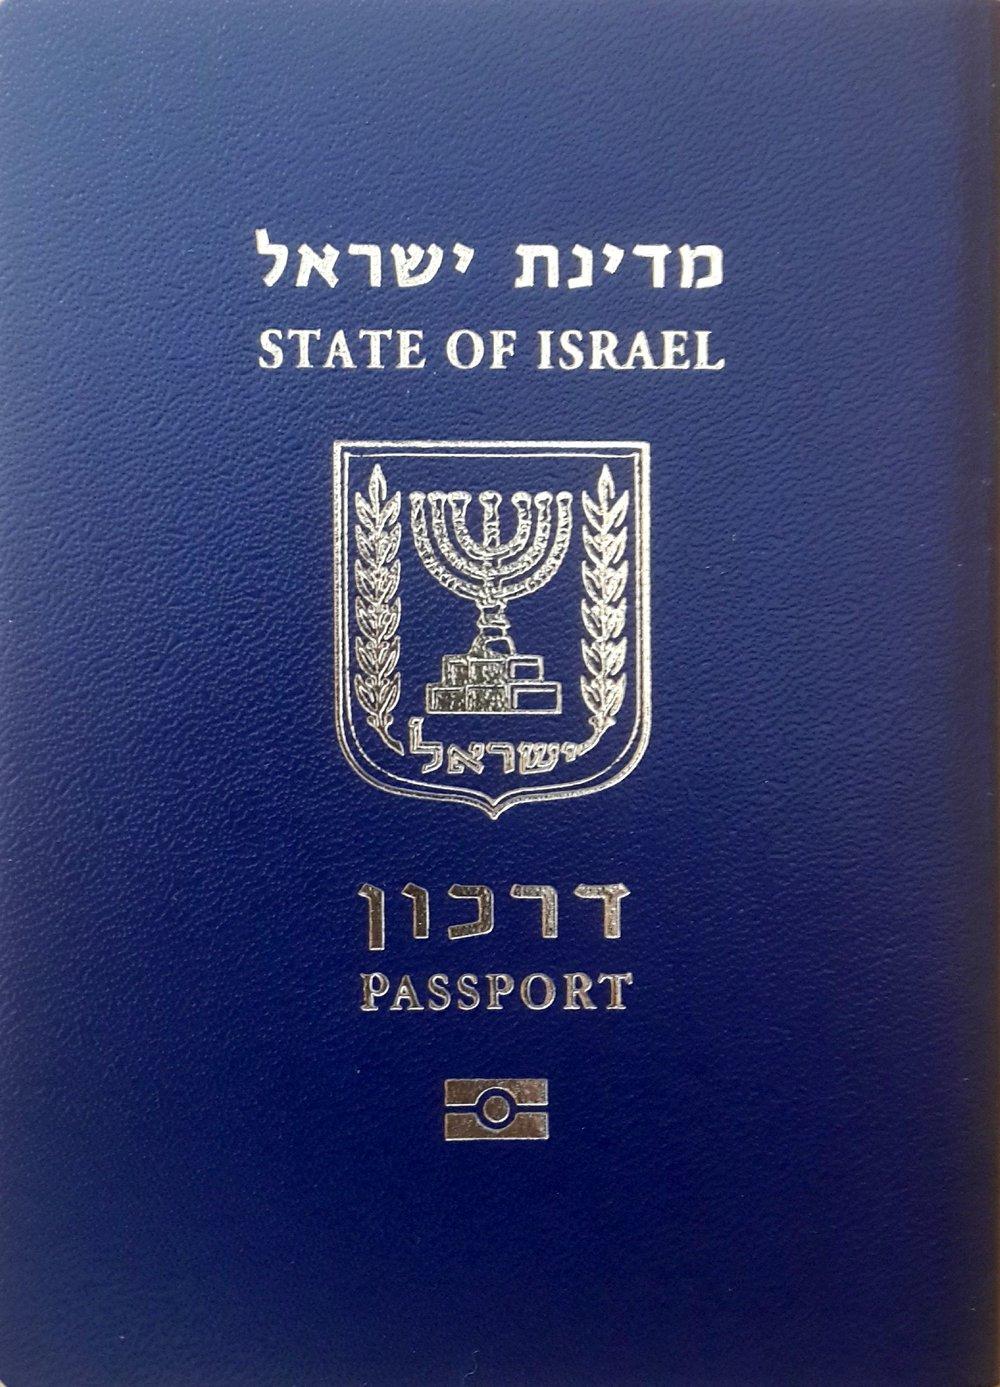 An Israeli passport. Credit: Wikimedia Commons.